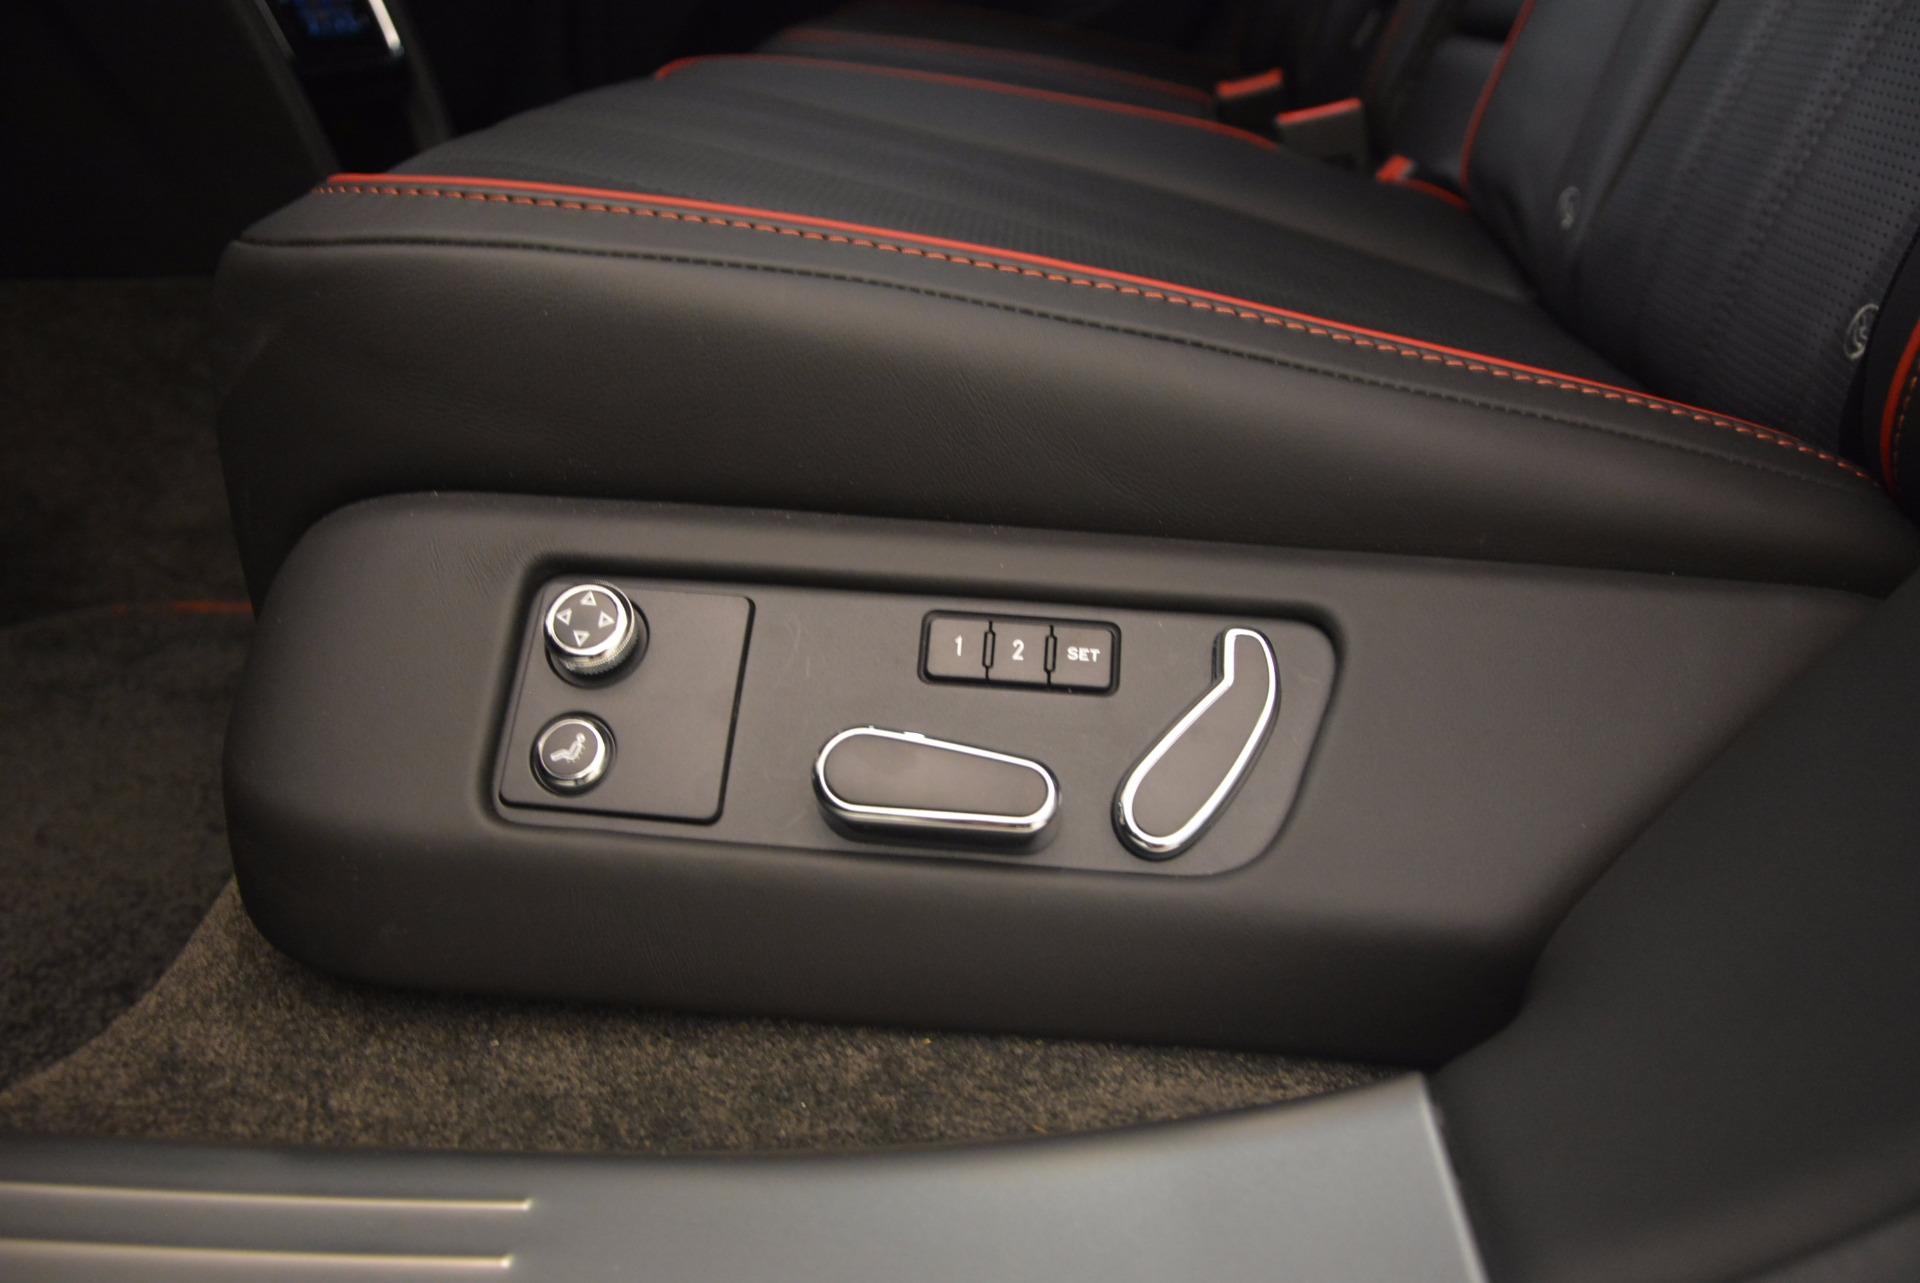 Used 2015 Bentley Flying Spur V8 For Sale In Westport, CT 1199_p39